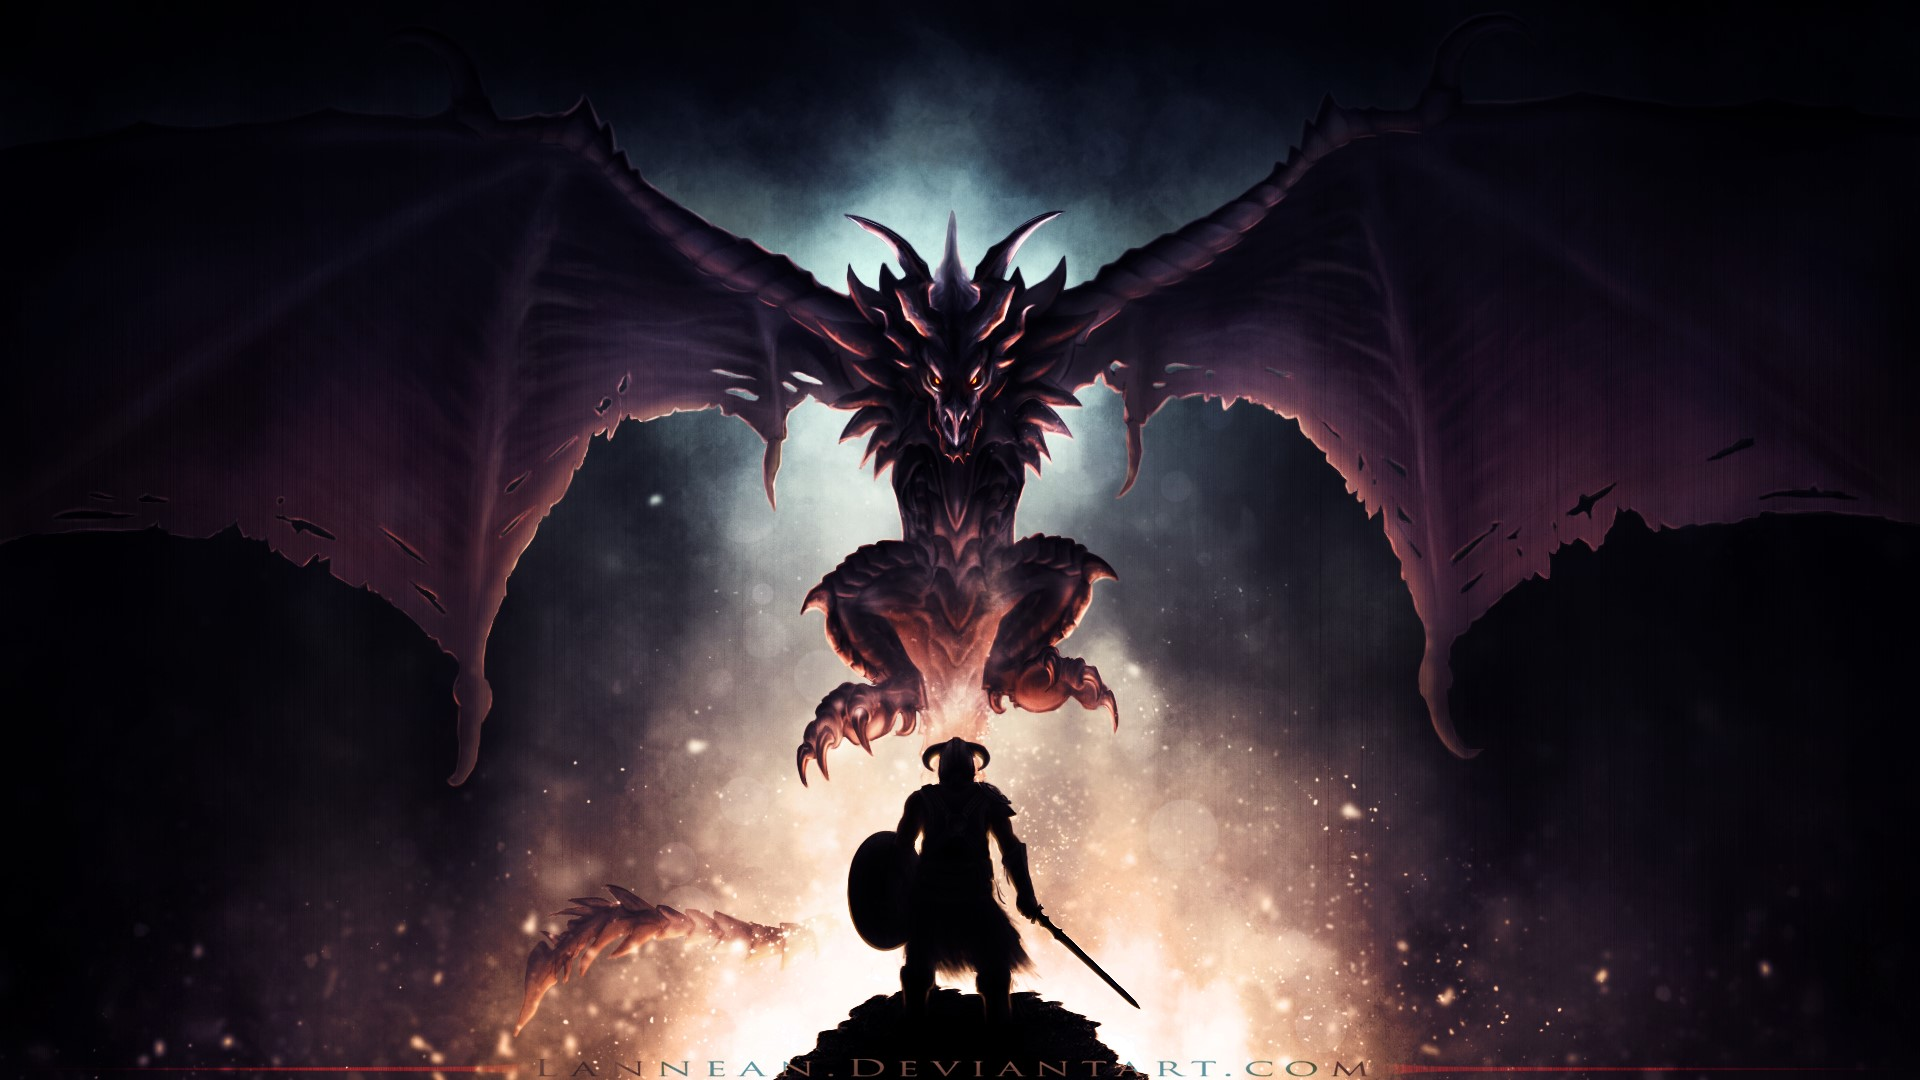 Dragonporn paradise hentia movie